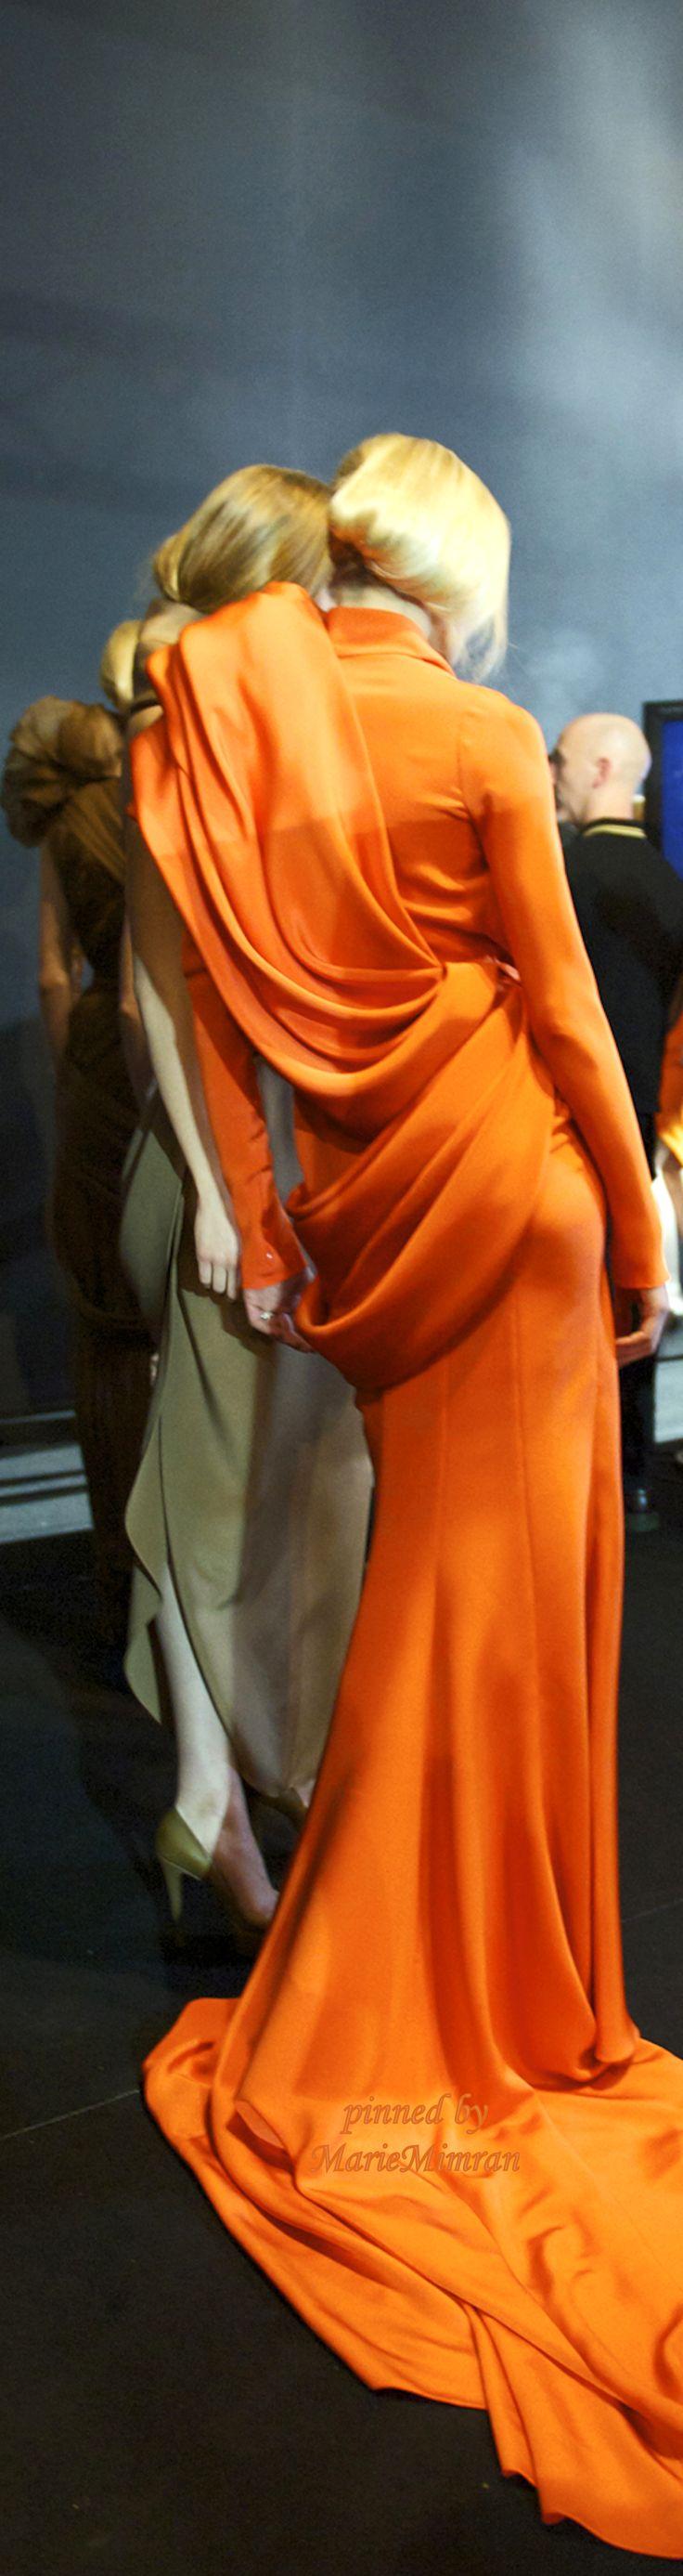 Backstage Fashion Show Stephane Rolland ++ rust orange + dress